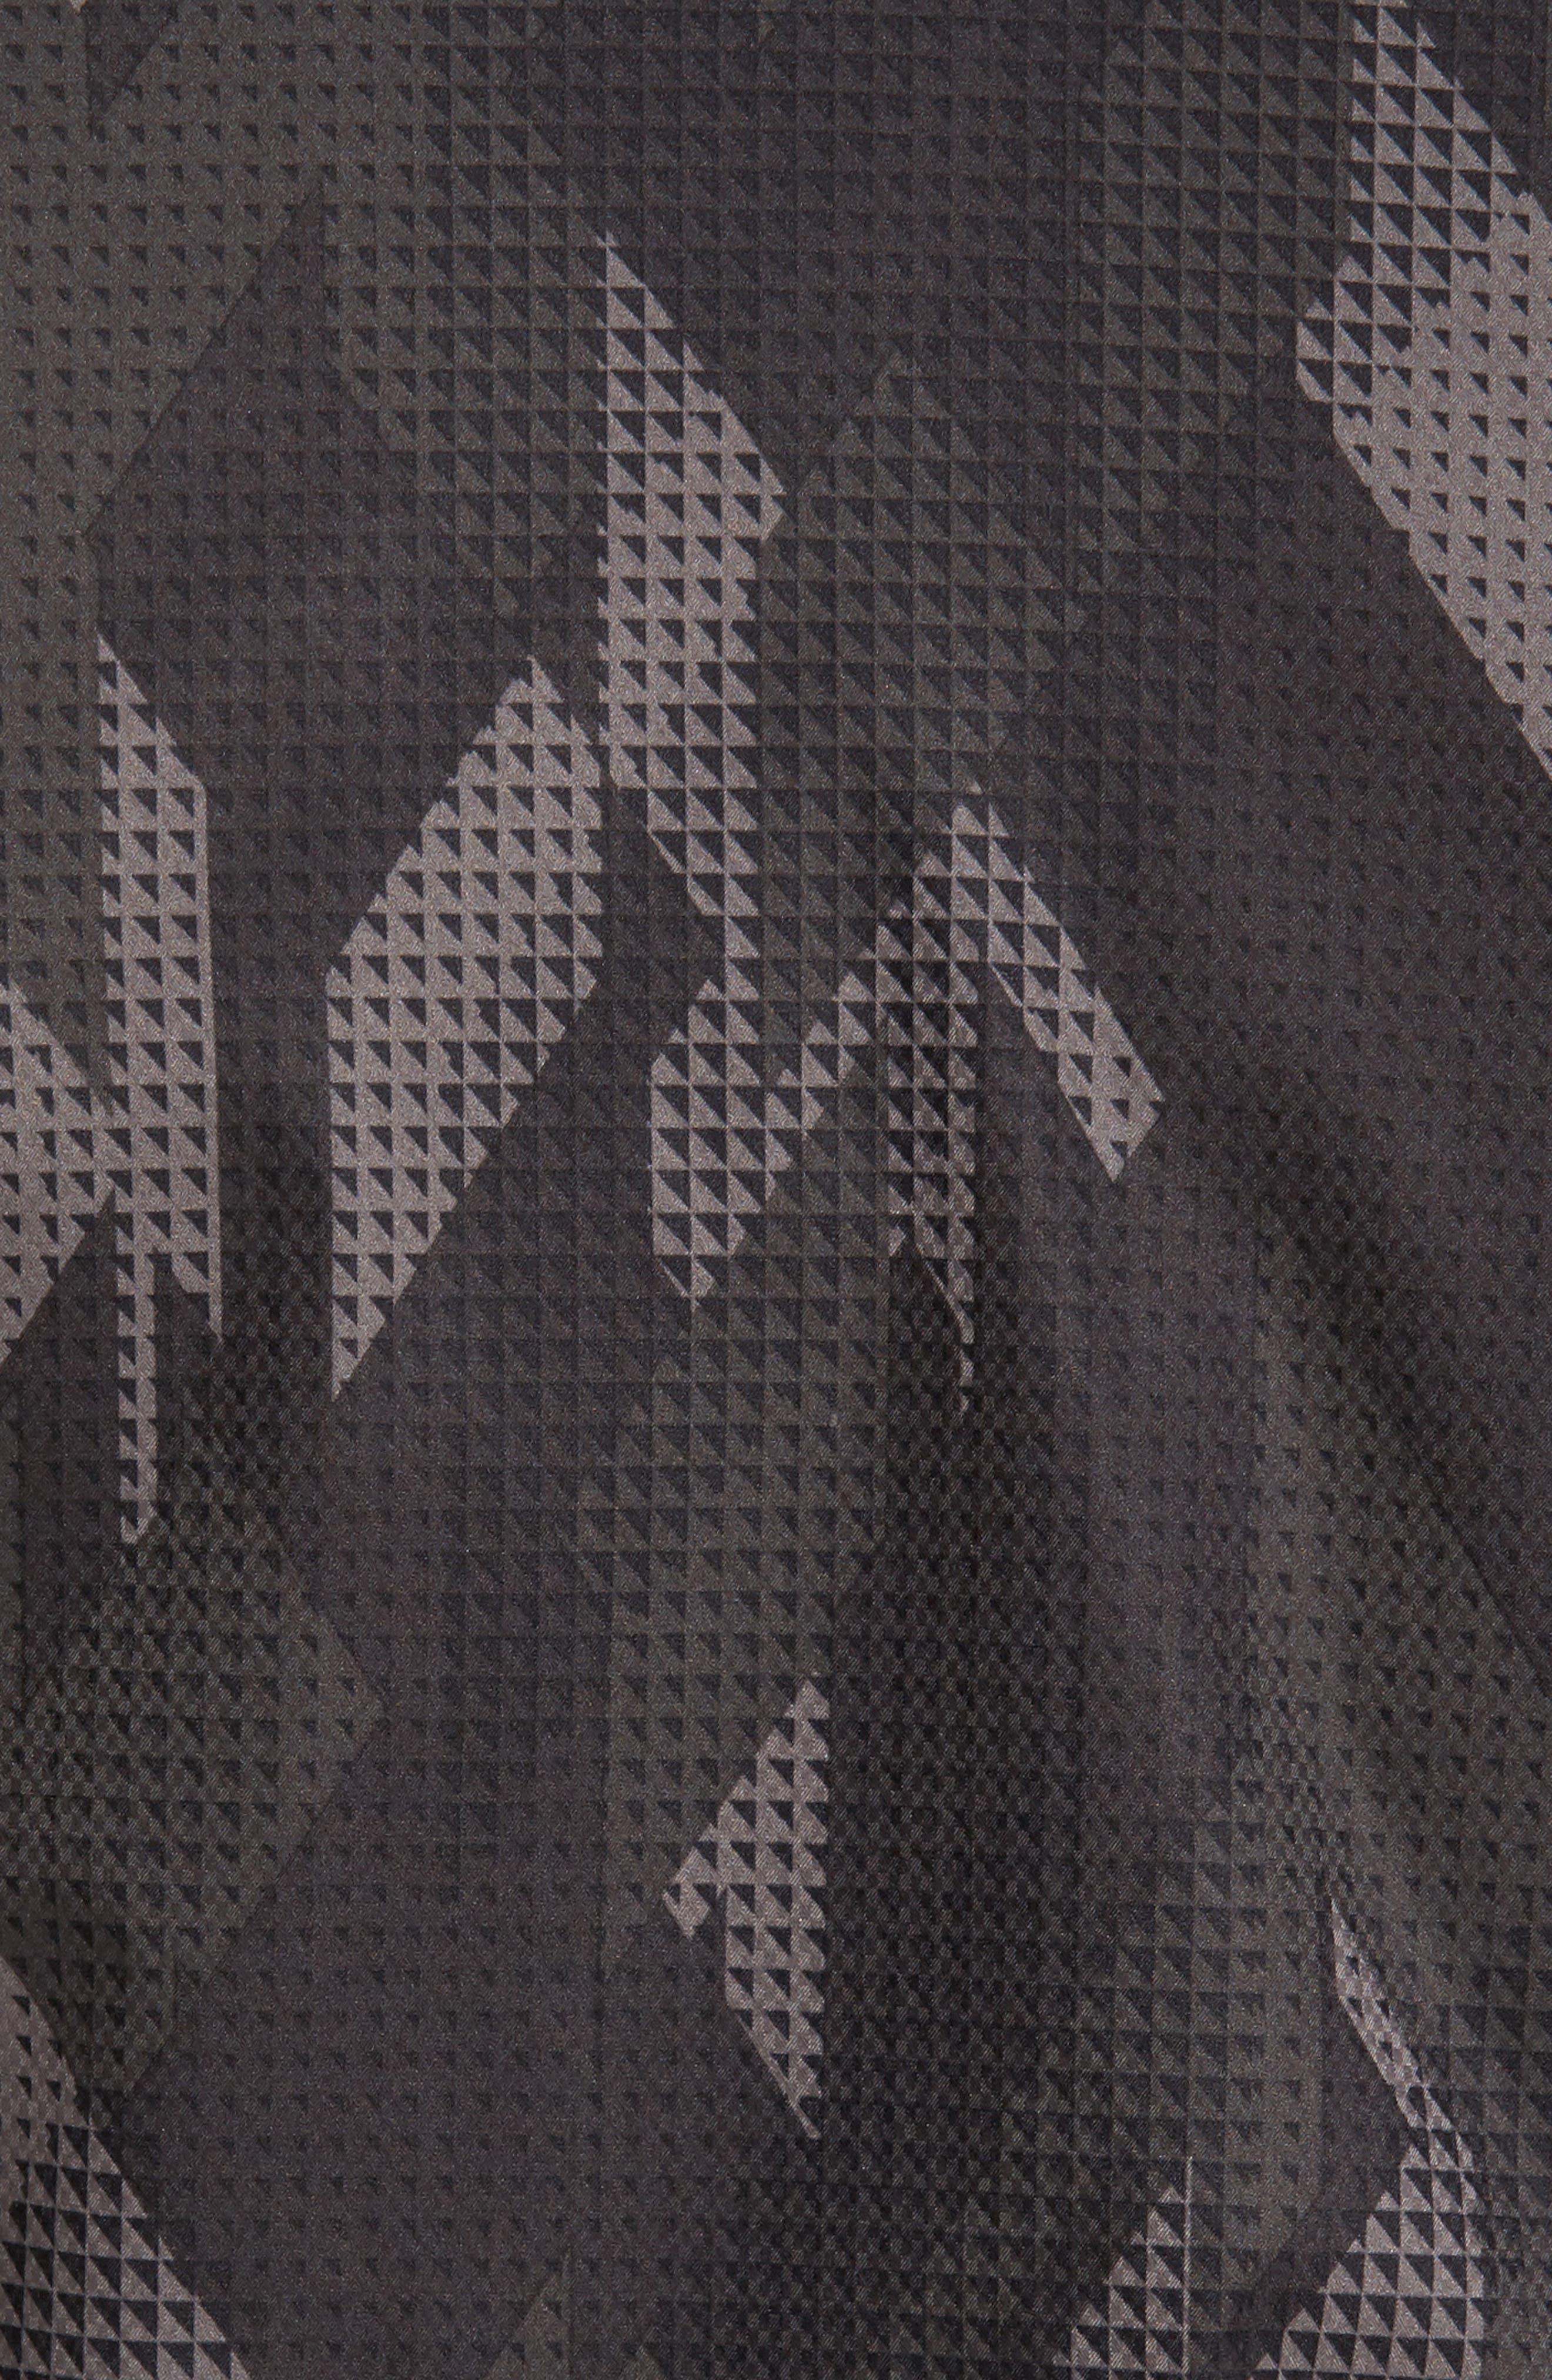 Flex Running Jacket,                             Alternate thumbnail 6, color,                             010